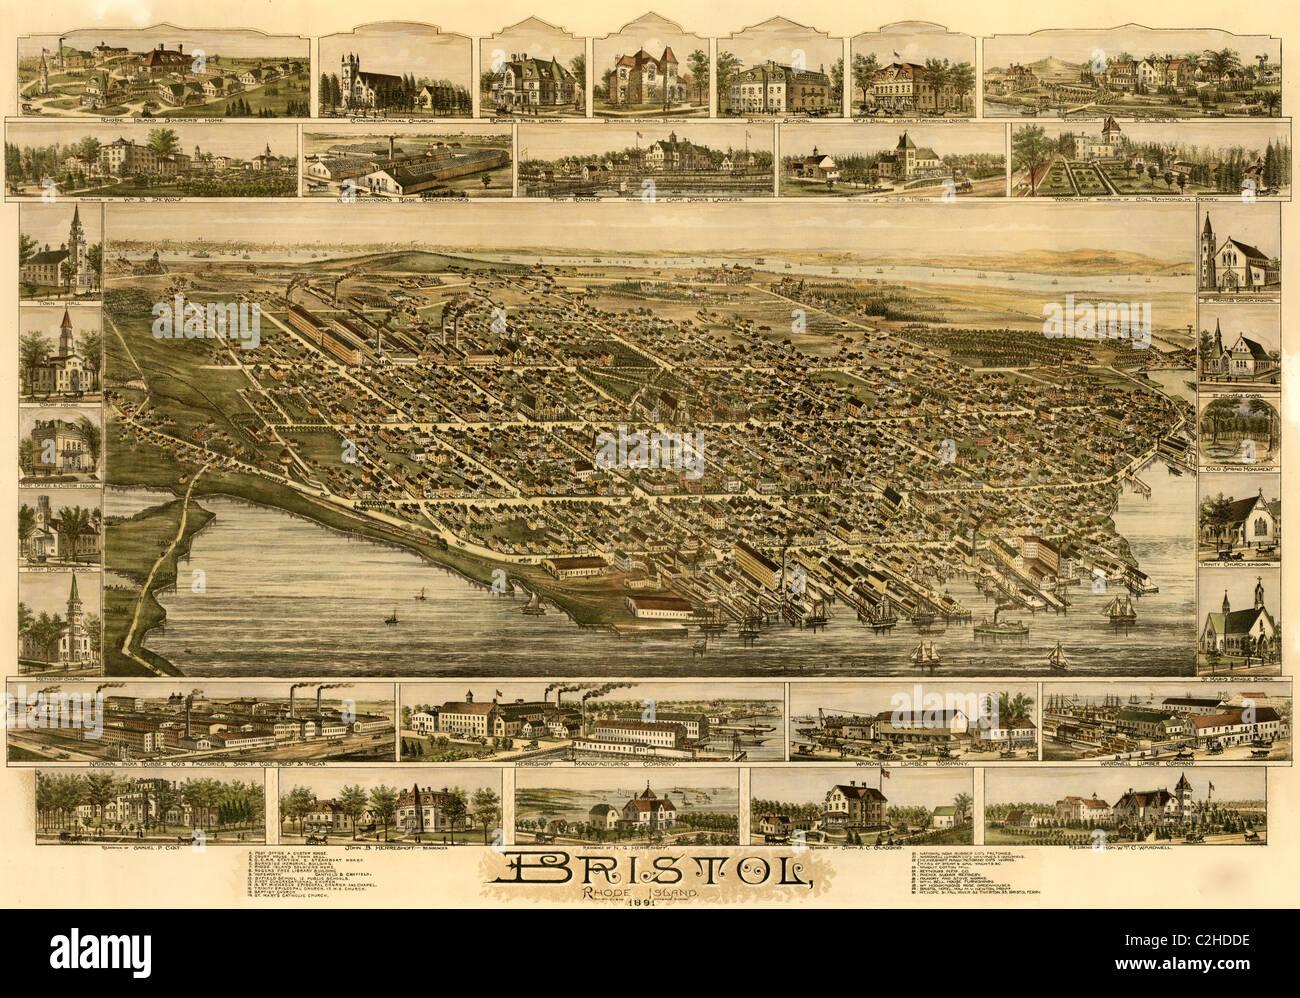 Bristol Rhode Island 1891 Stock Image